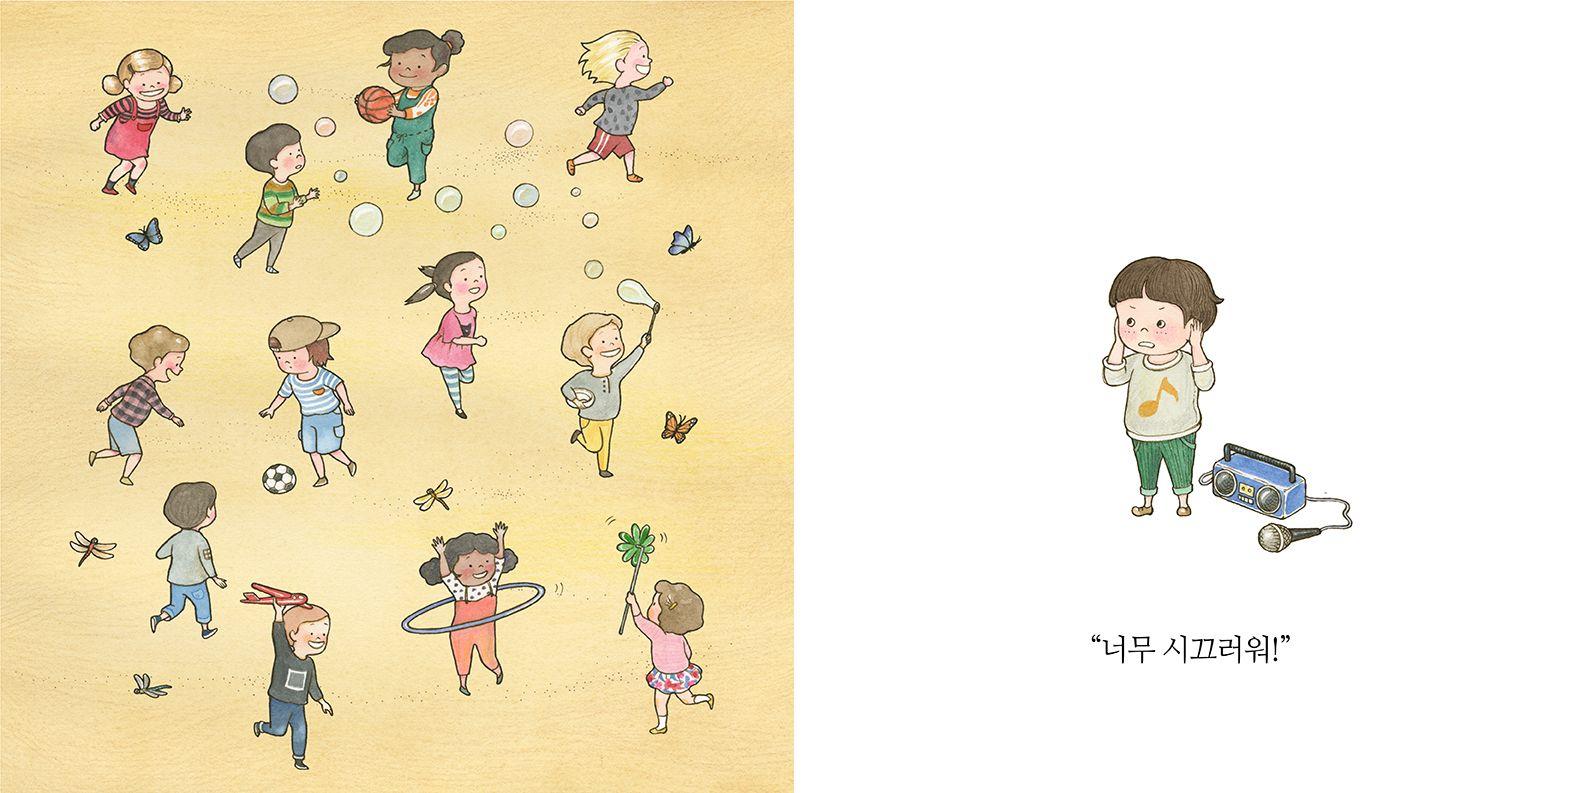 Scott's Special Sound for NC Soft - Eunyoung Seo #scott #sound #recording #learning #education #resources #teacher #teaching #cute #childrensbook #illustration #kidlitart #kidlitartist #read #raiseareader #books #eunyoungseo